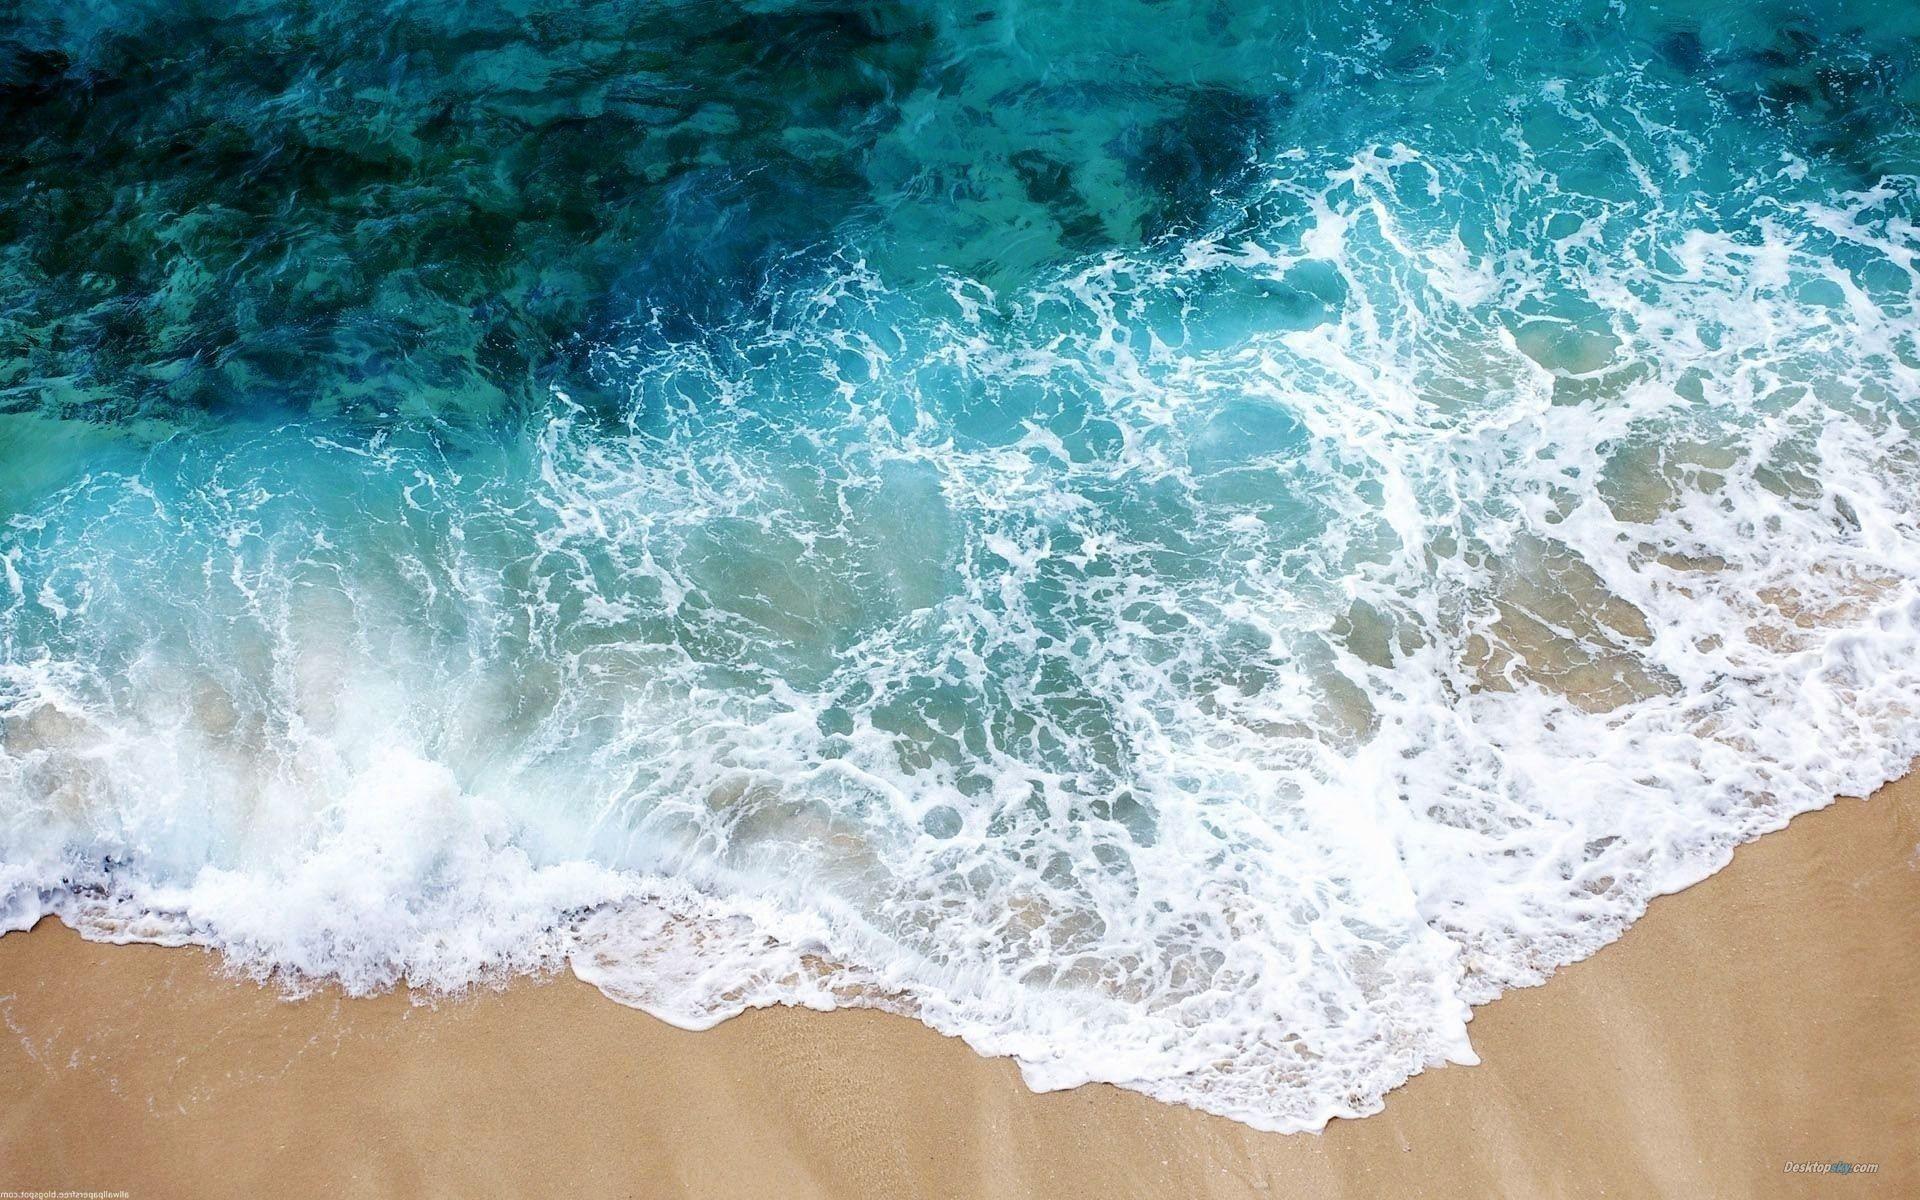 Best 25+ Summer desktop backgrounds ideas on Pinterest | Laptop backgrounds,  Mac wallpaper and Laptop wallpaper